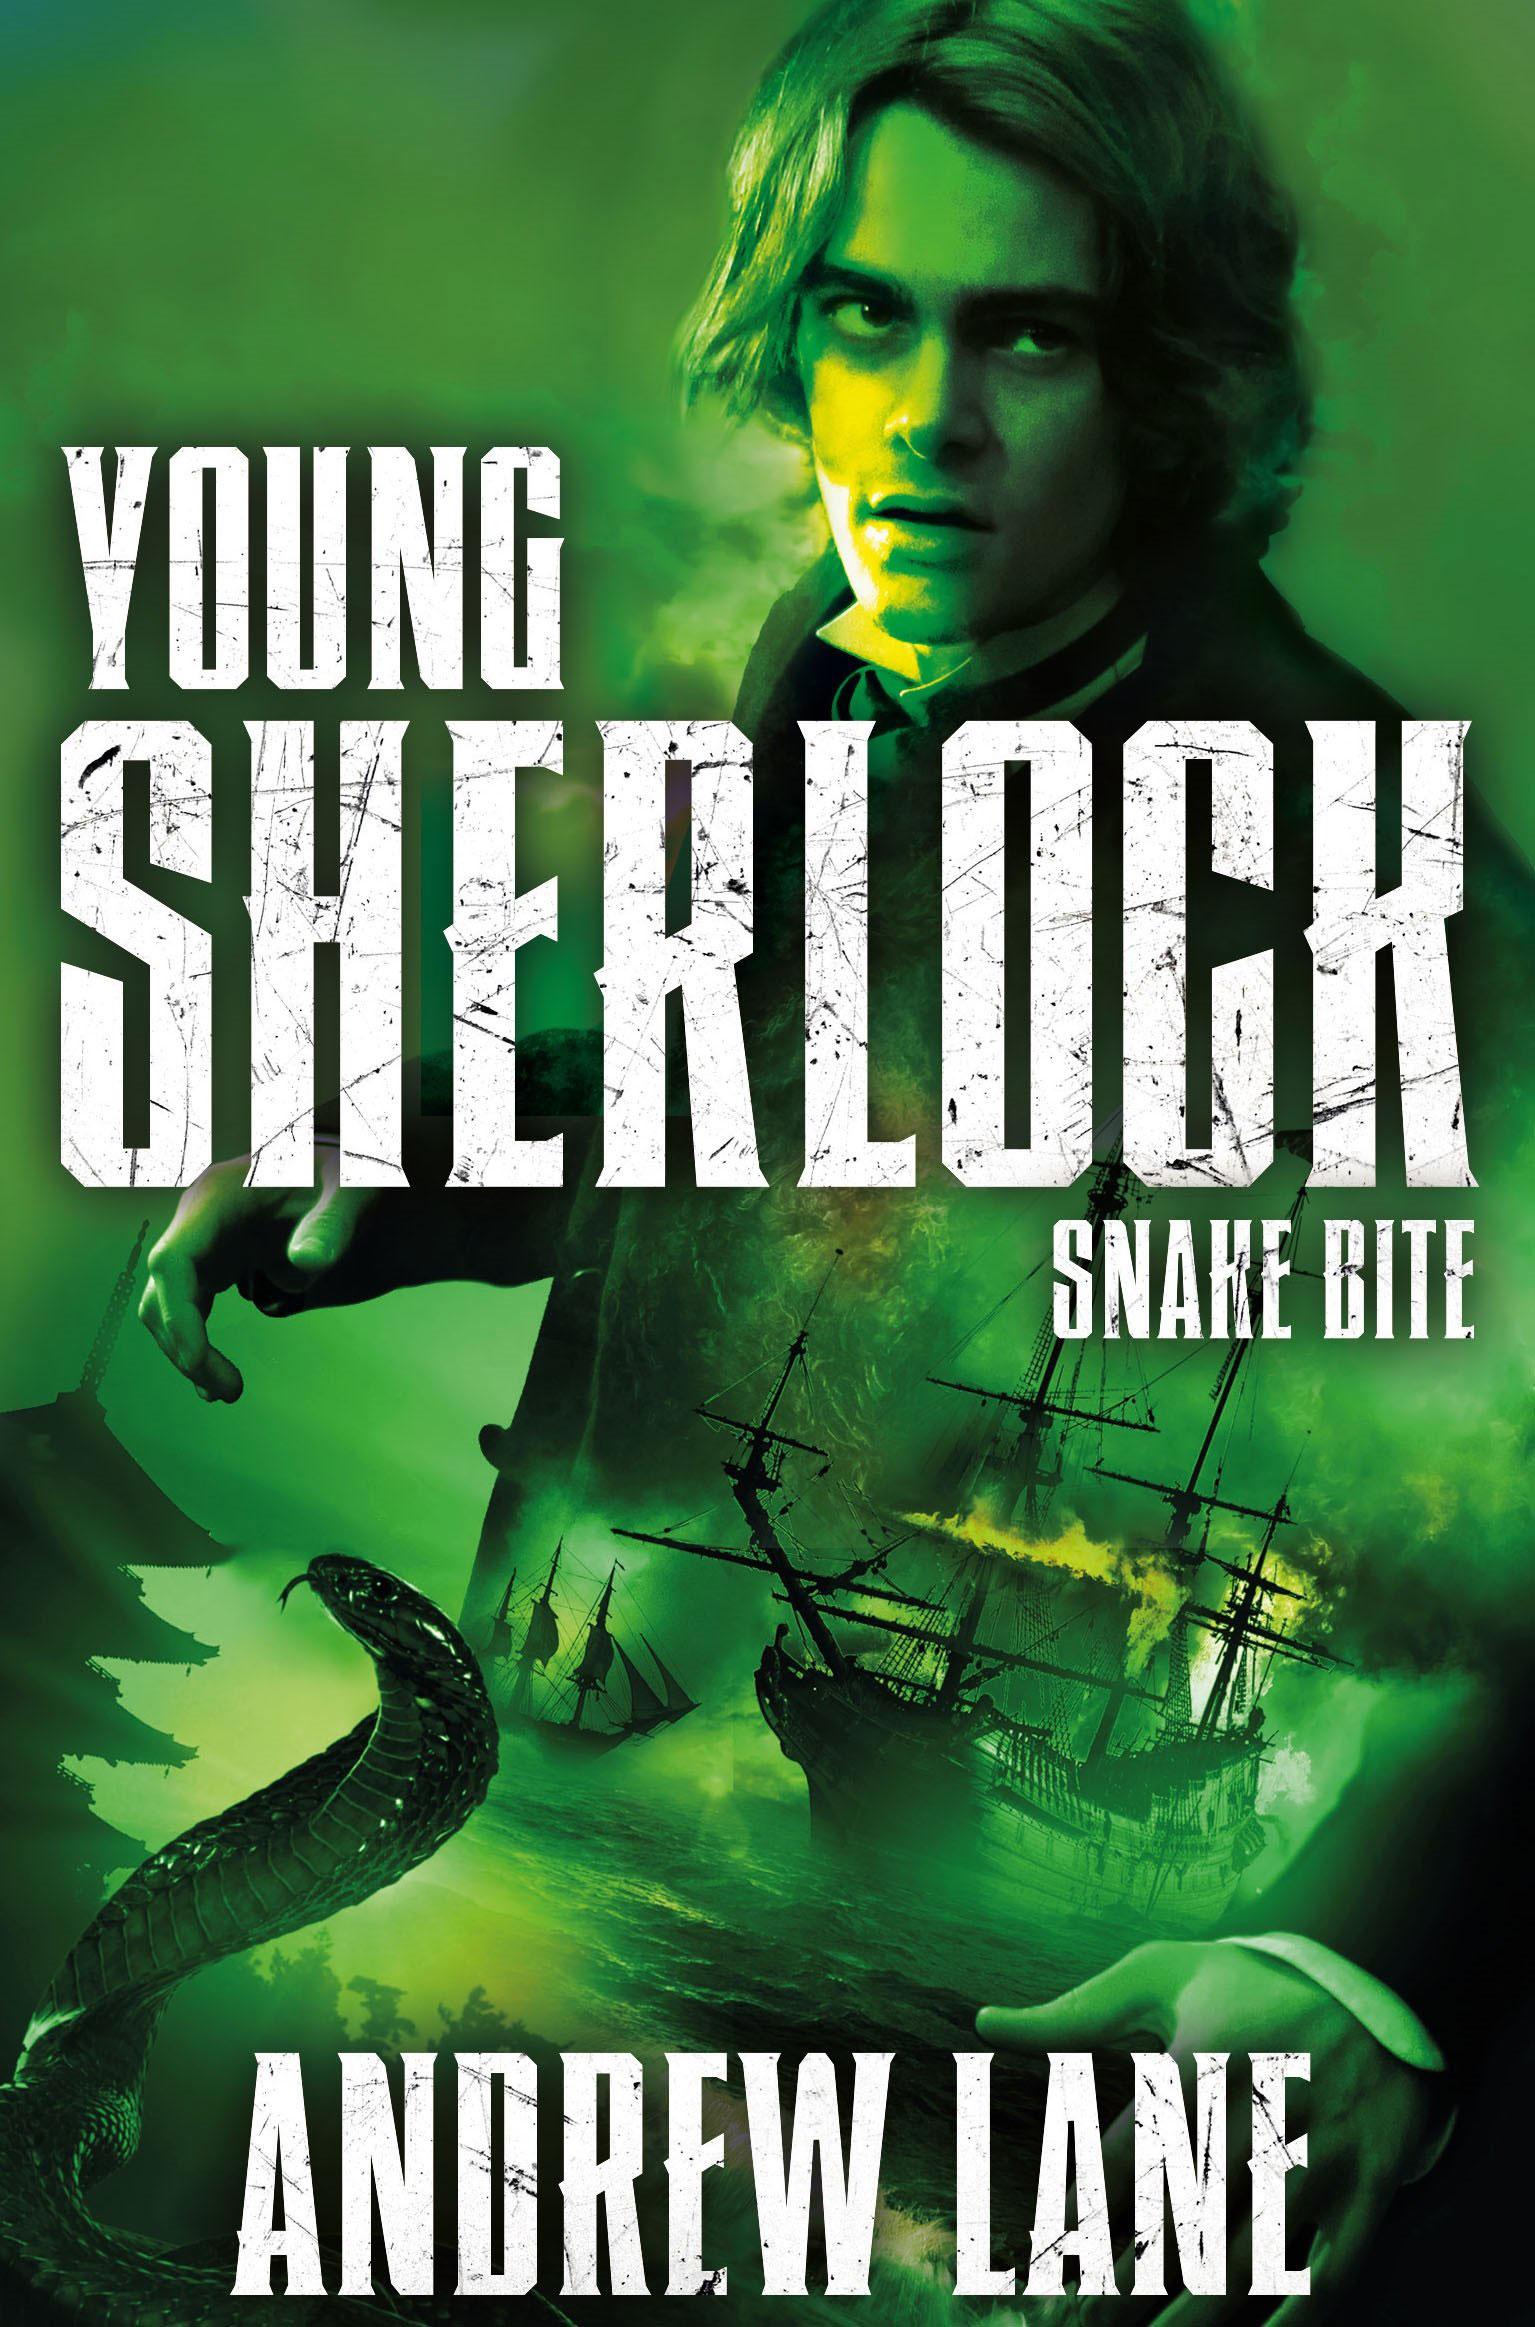 Young Sherlock Holmes: Snake Bite